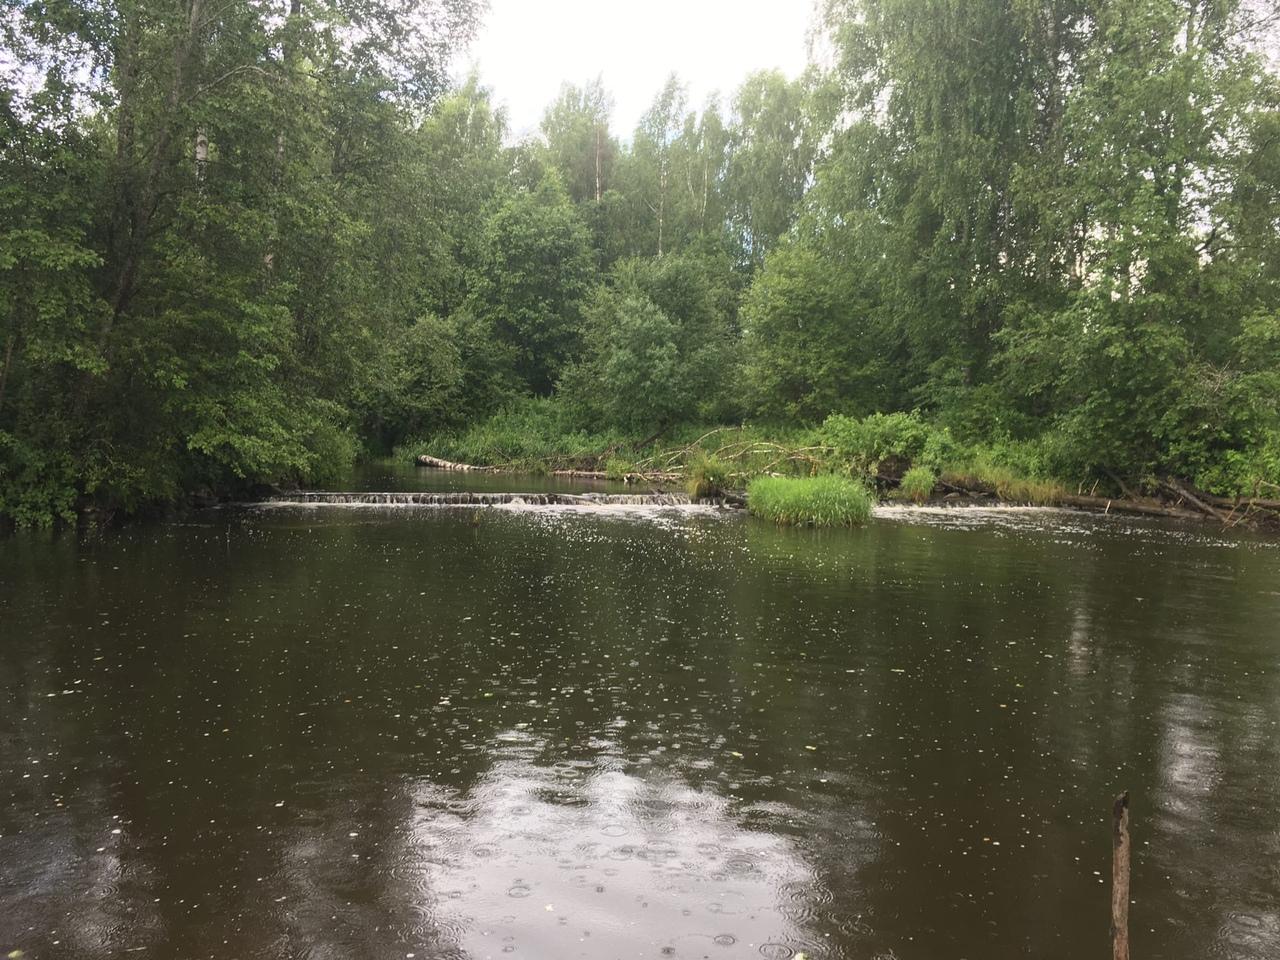 брёвна, перегораживающие реку